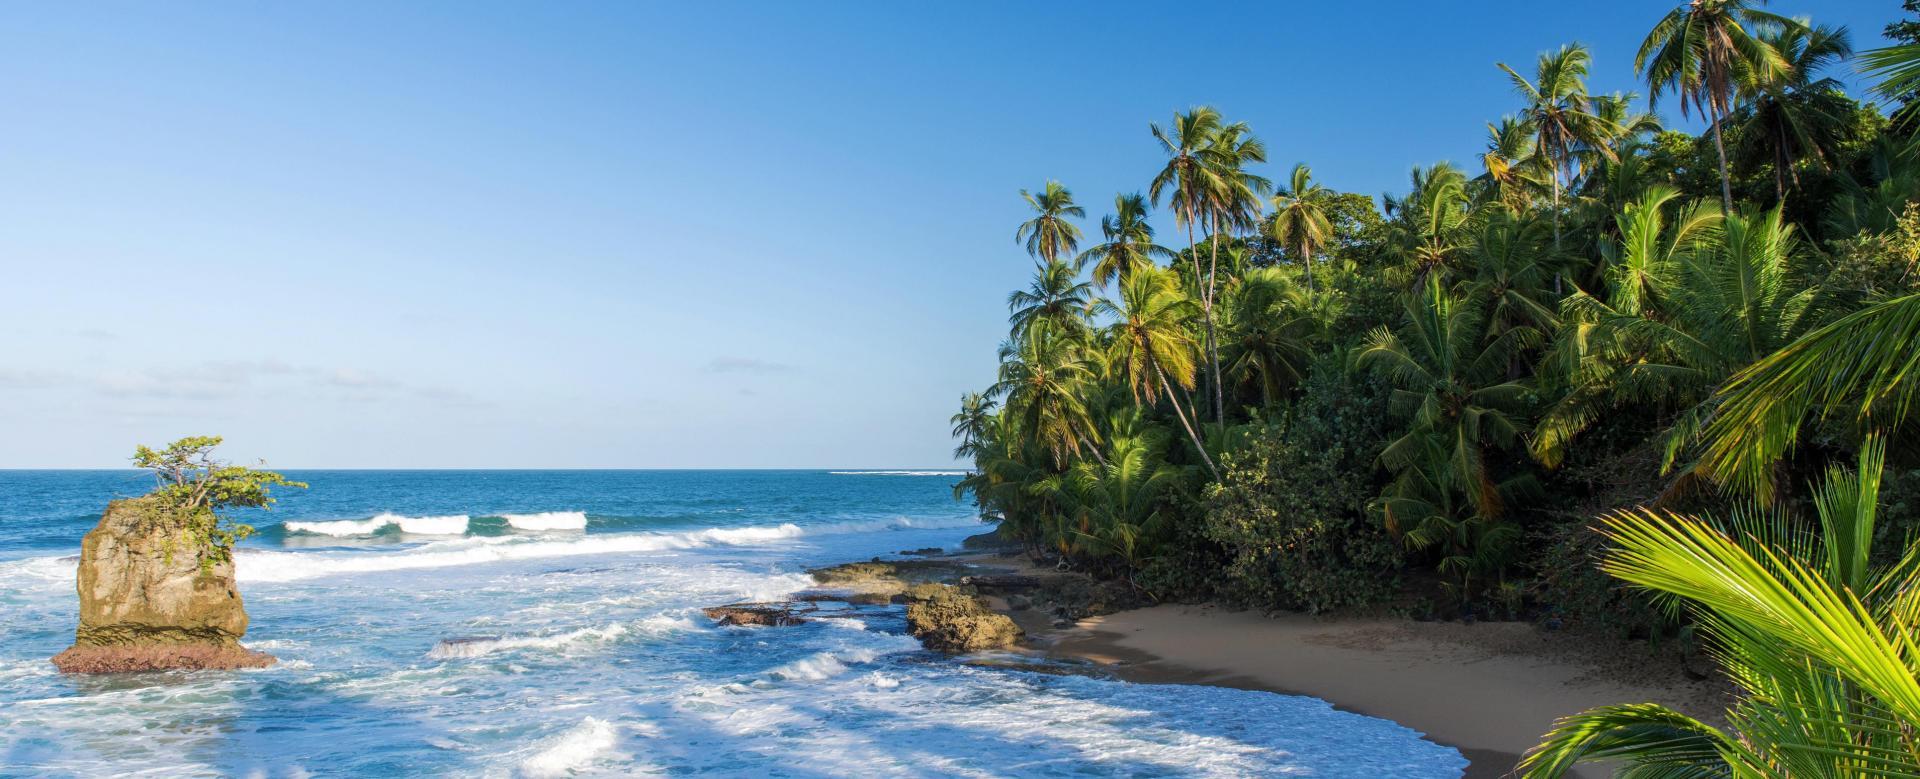 Voyage en véhicule Costa Rica : L'aventure nature